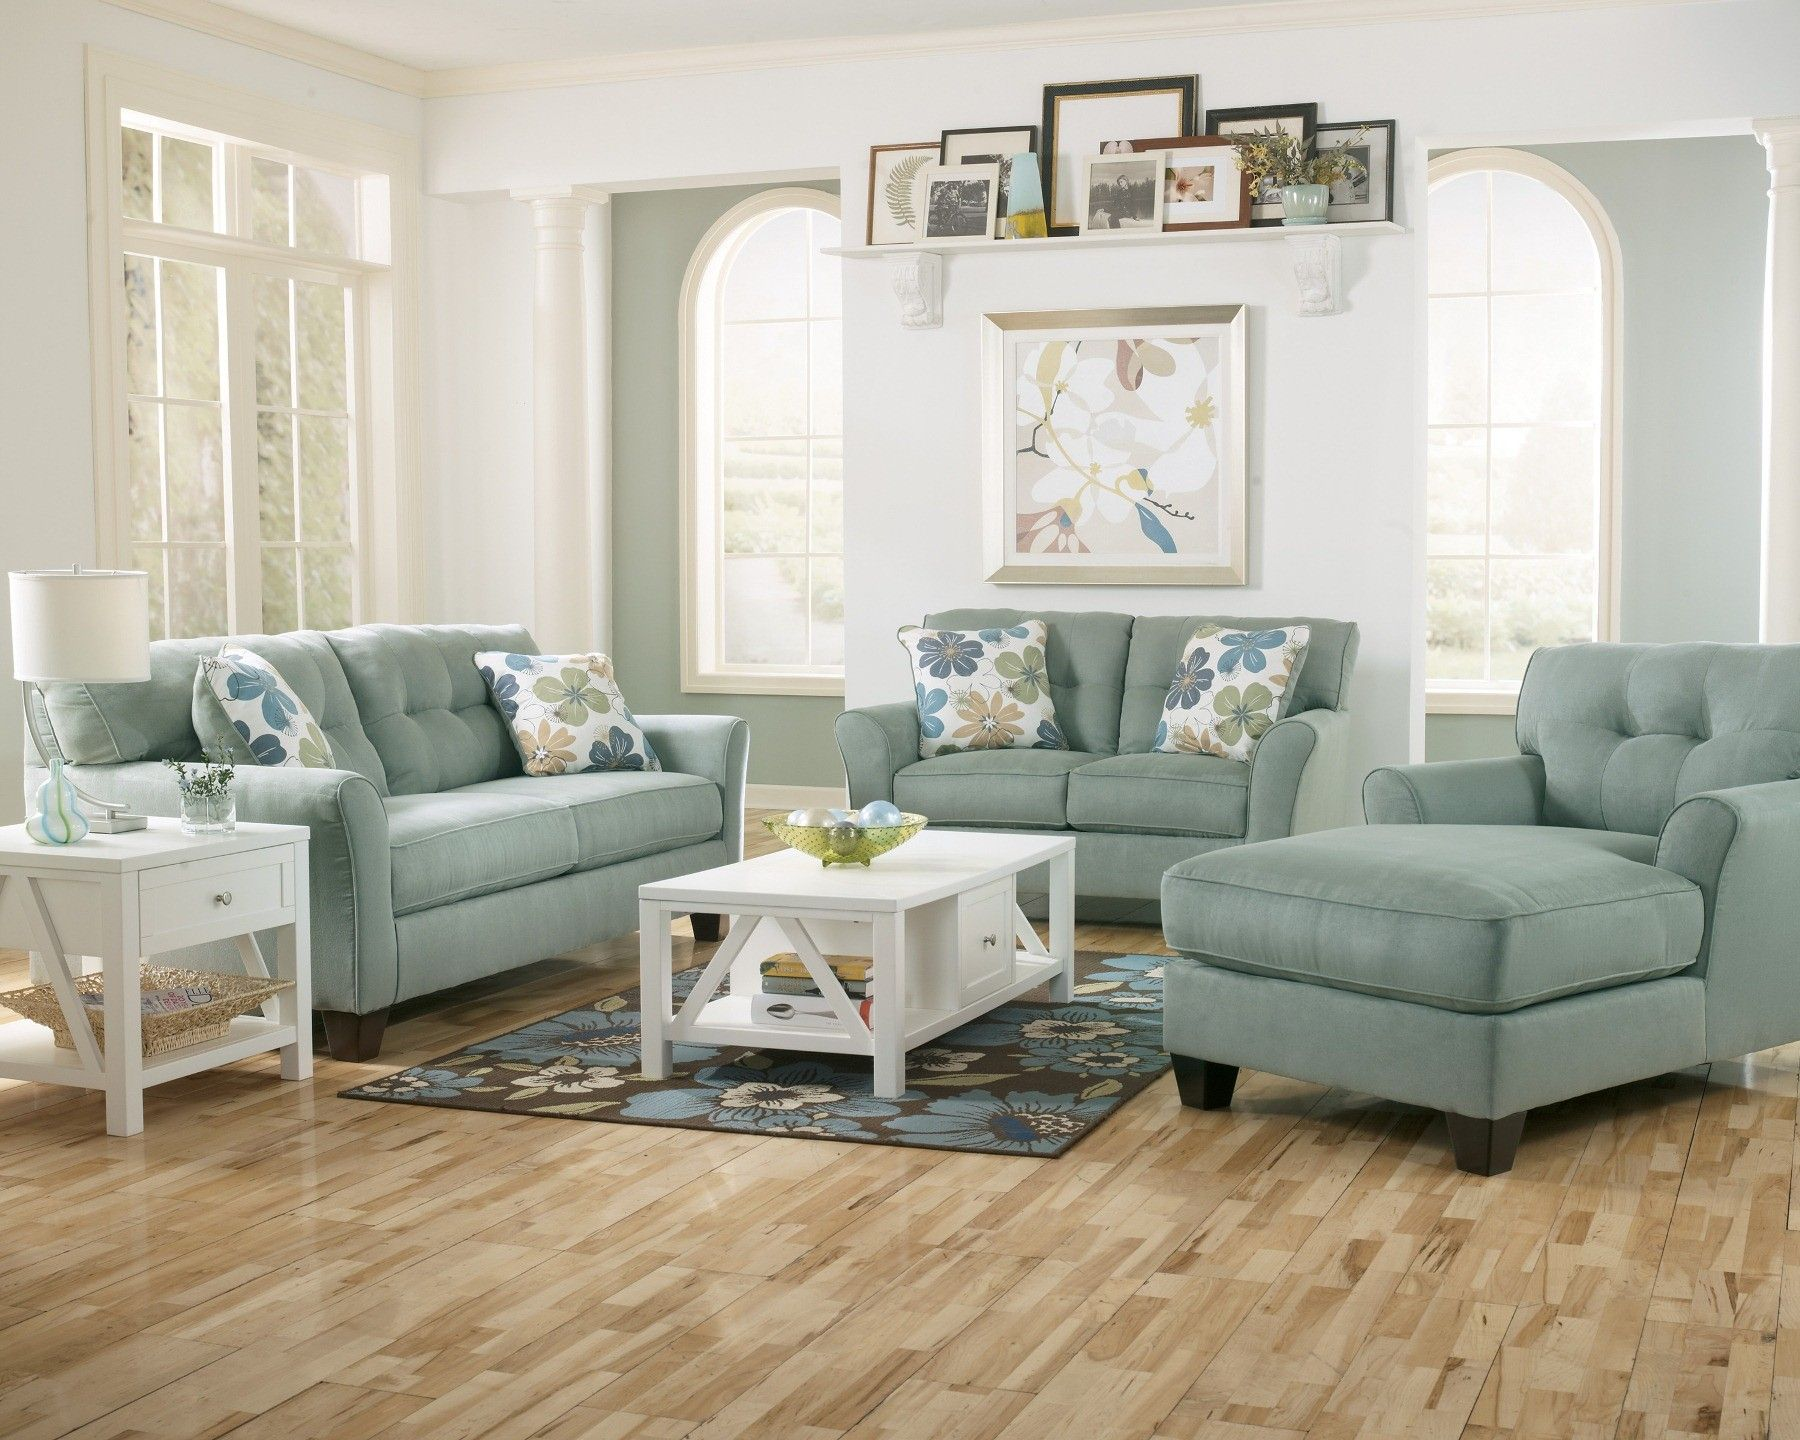 Kylee Lagoon Colorful Sofa Sets Pinterest Room Set